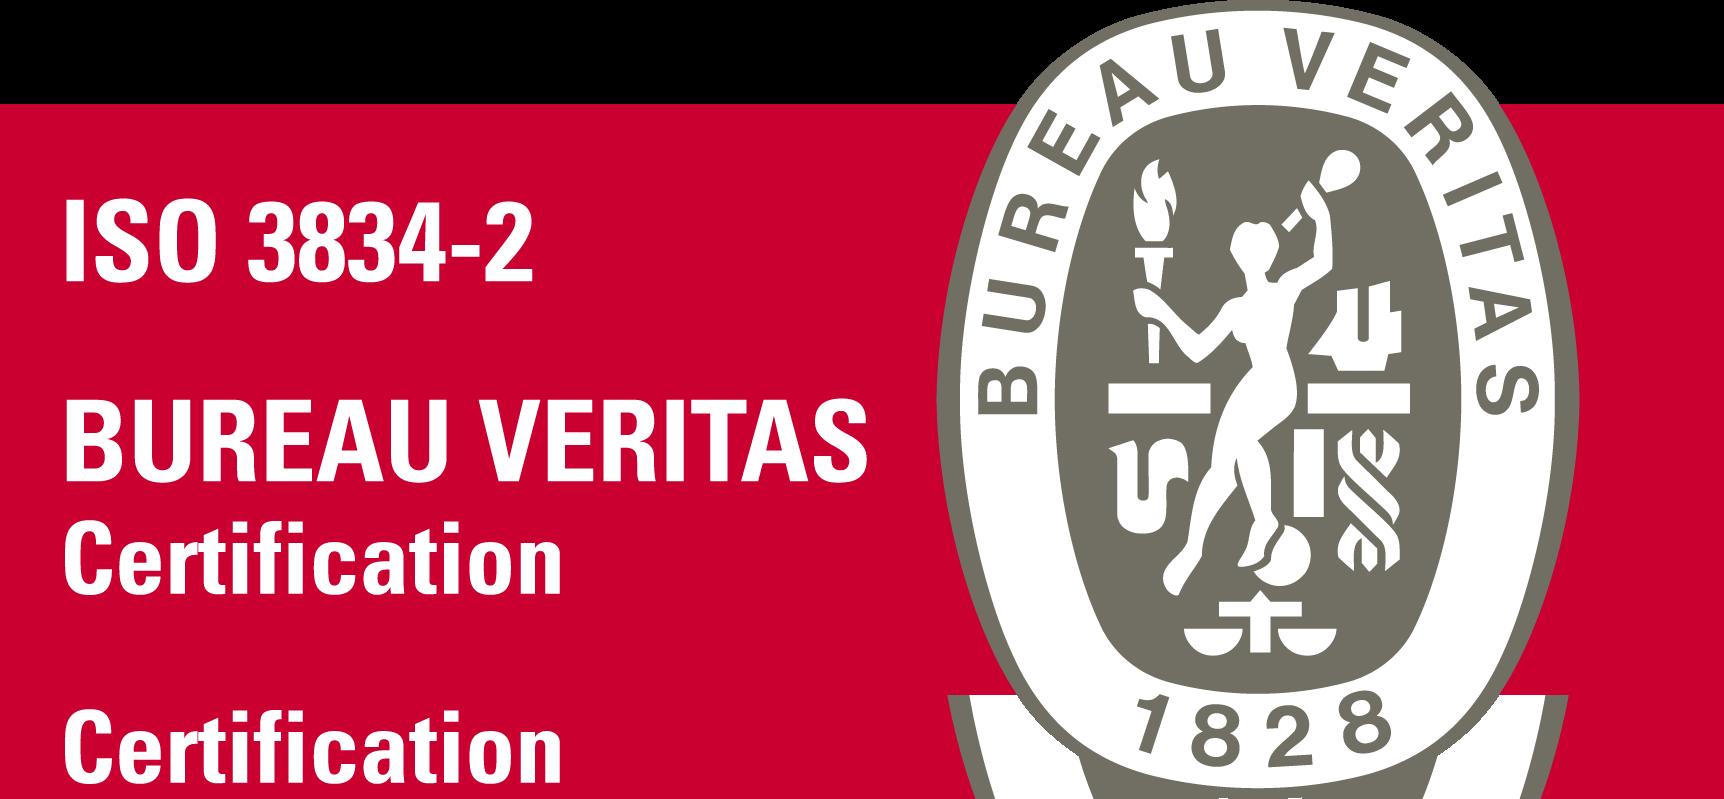 BV_Certification_ISO3834-2_tracciati